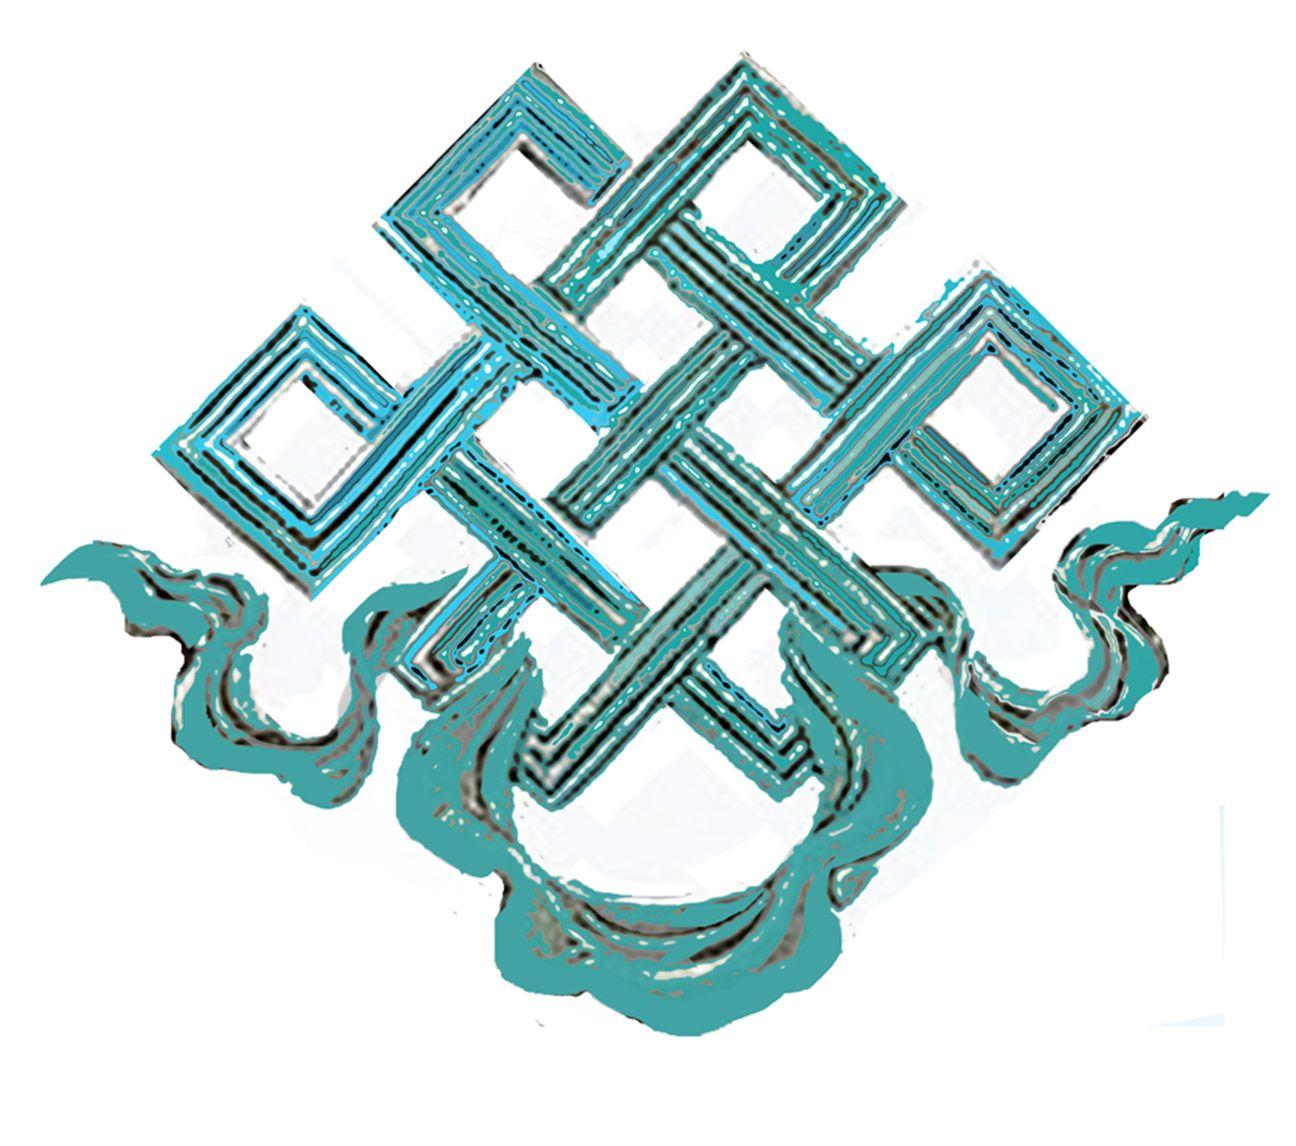 Endless Knot Buddhist Symbol Turquoise Pinterest Buddhist